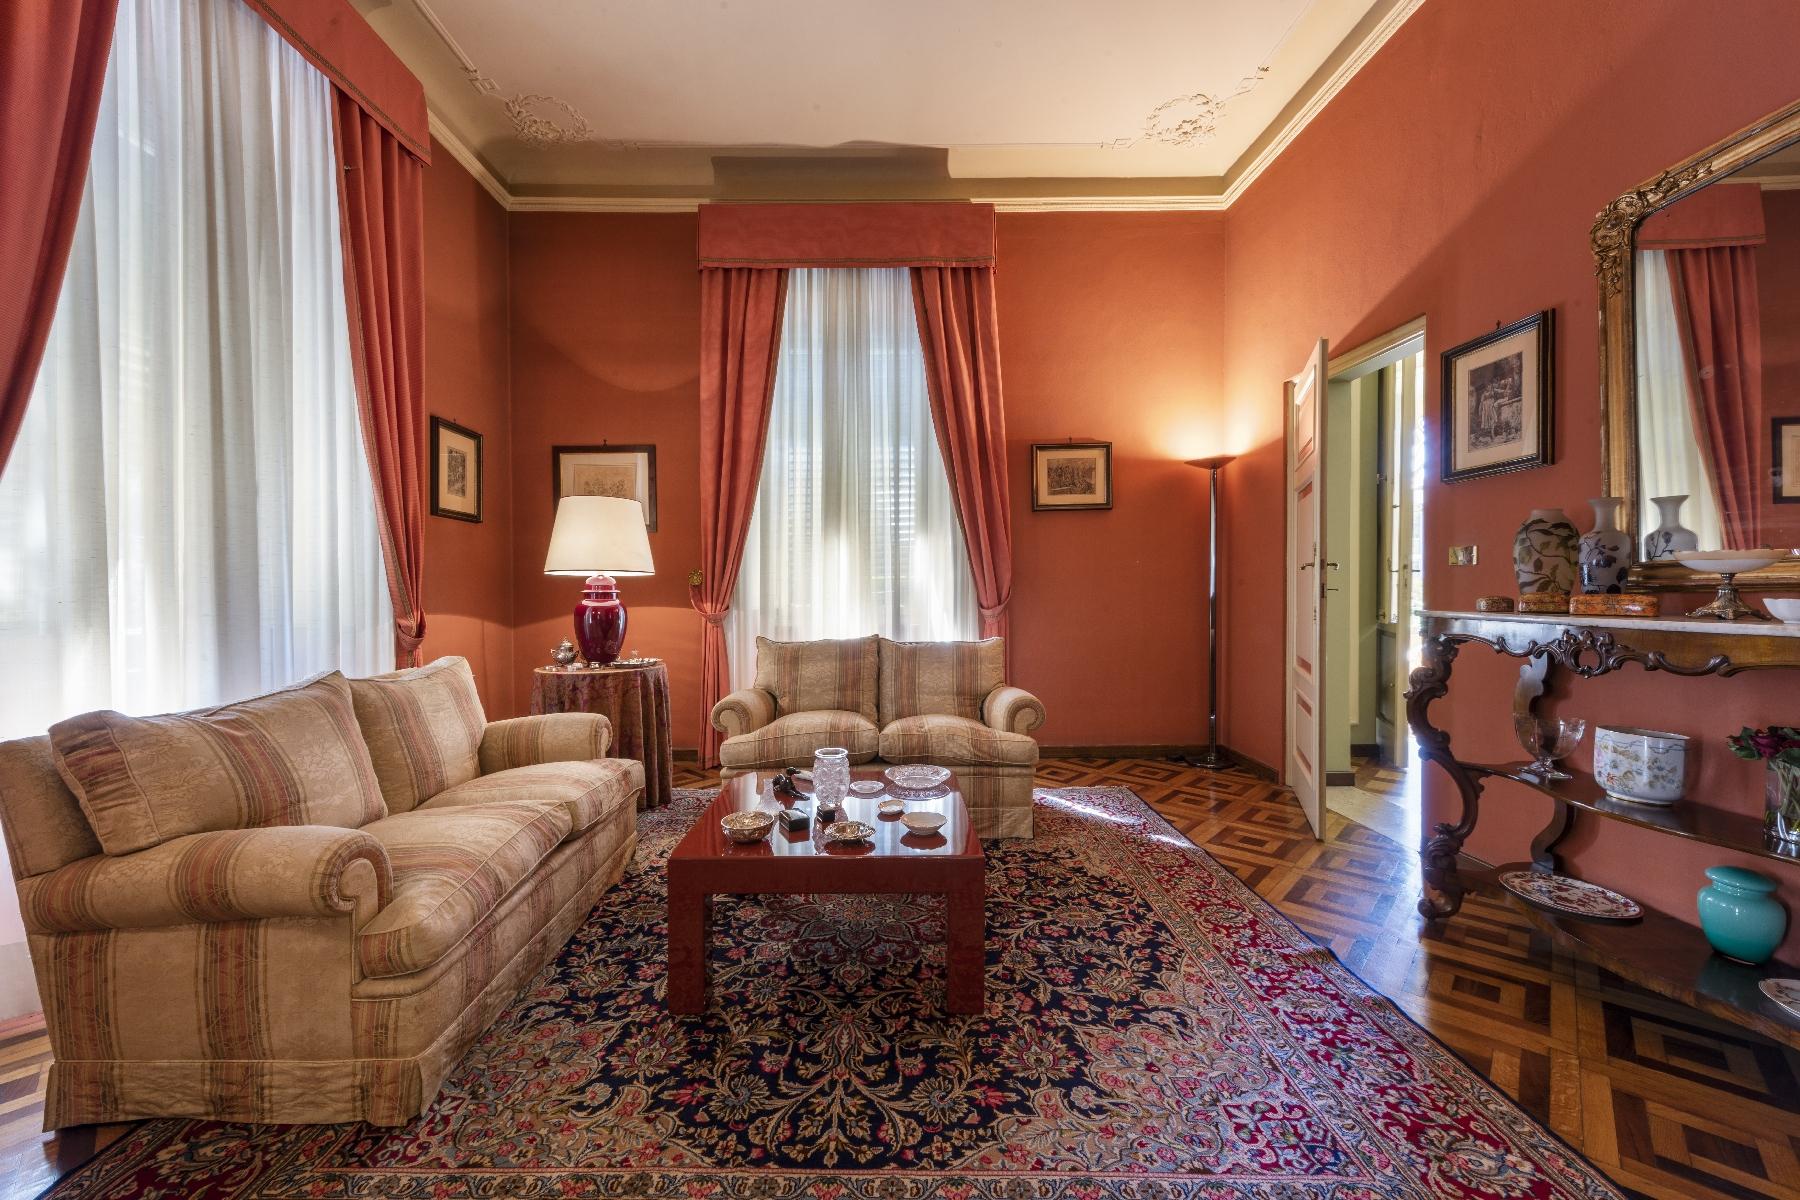 Villa in Vendita a Lucca: 5 locali, 660 mq - Foto 10